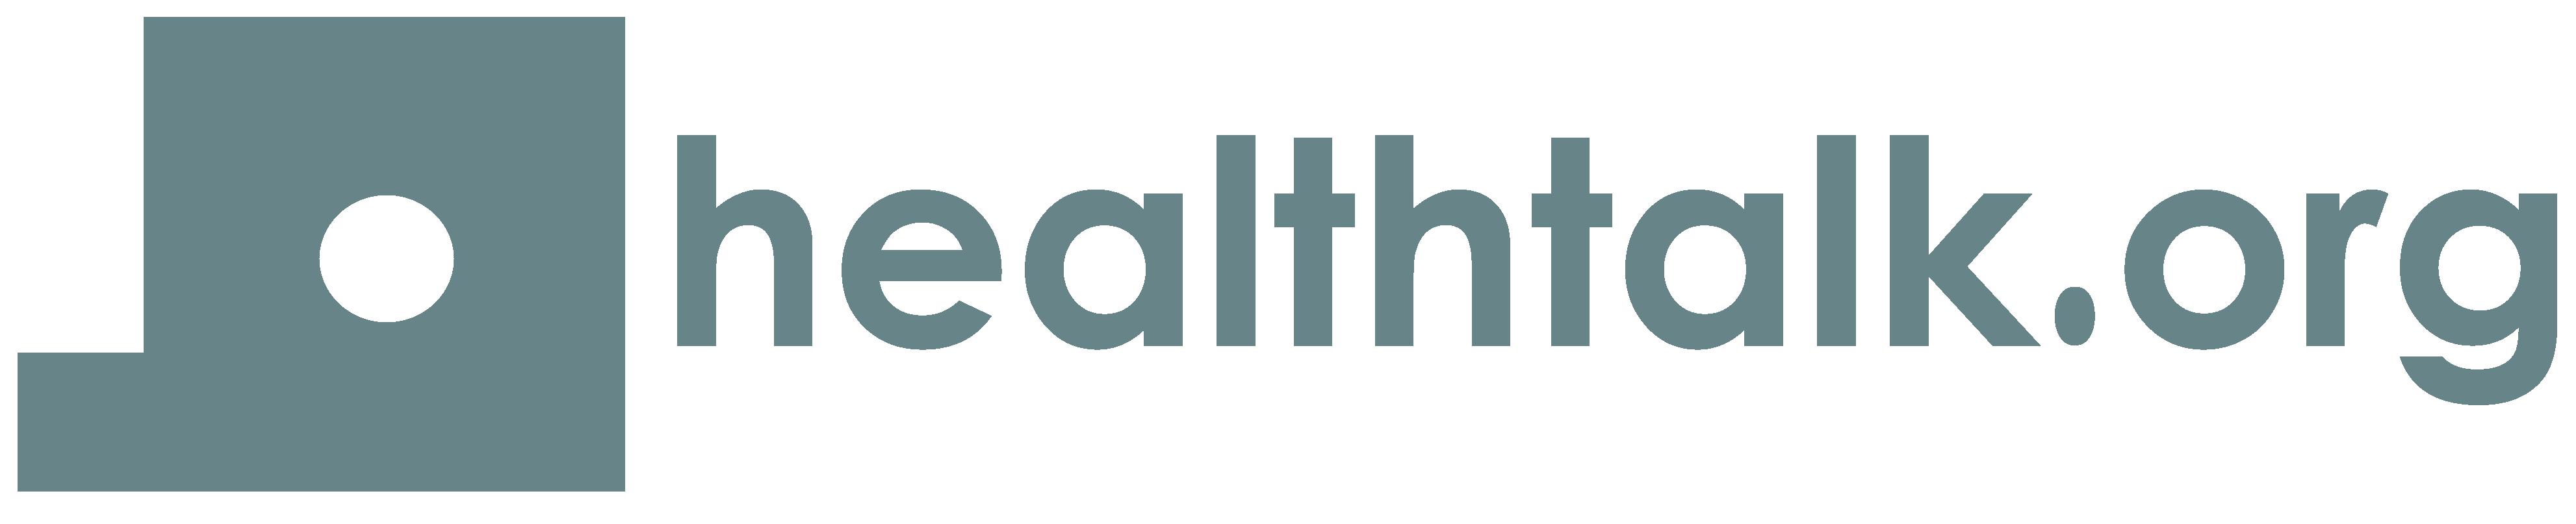 Healthtalk.org logo